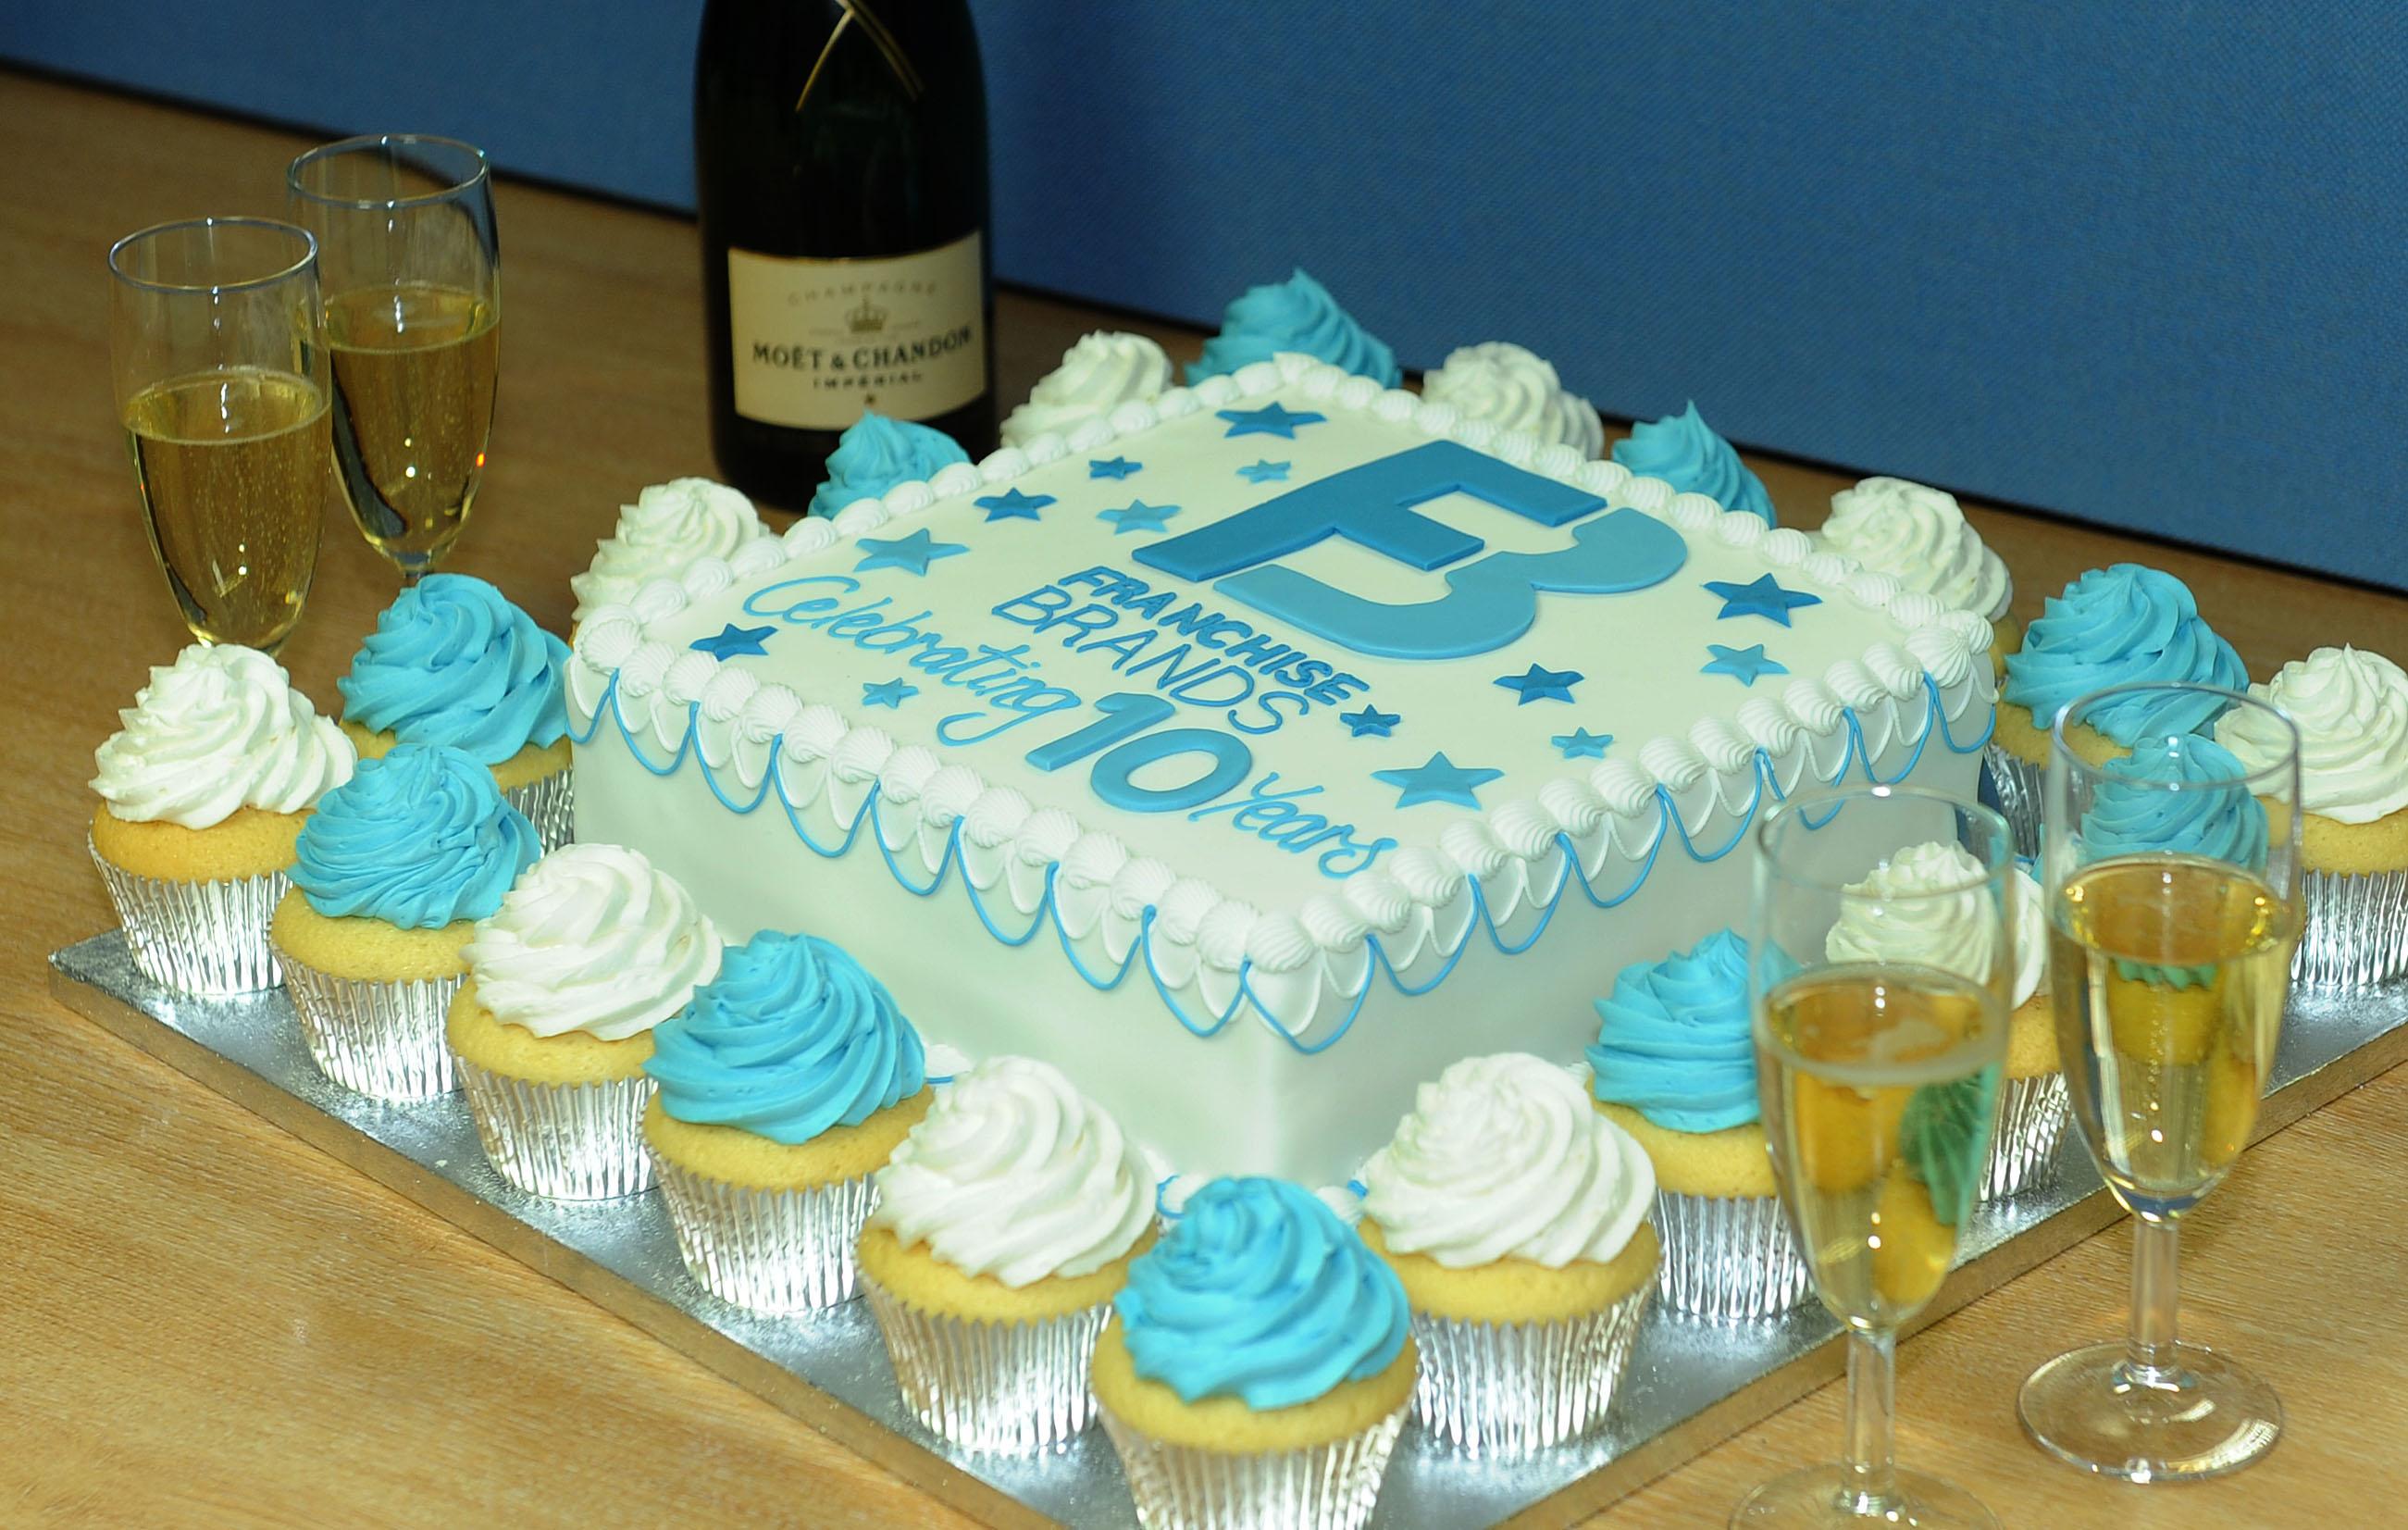 Franchise Brands Anniversary Cake